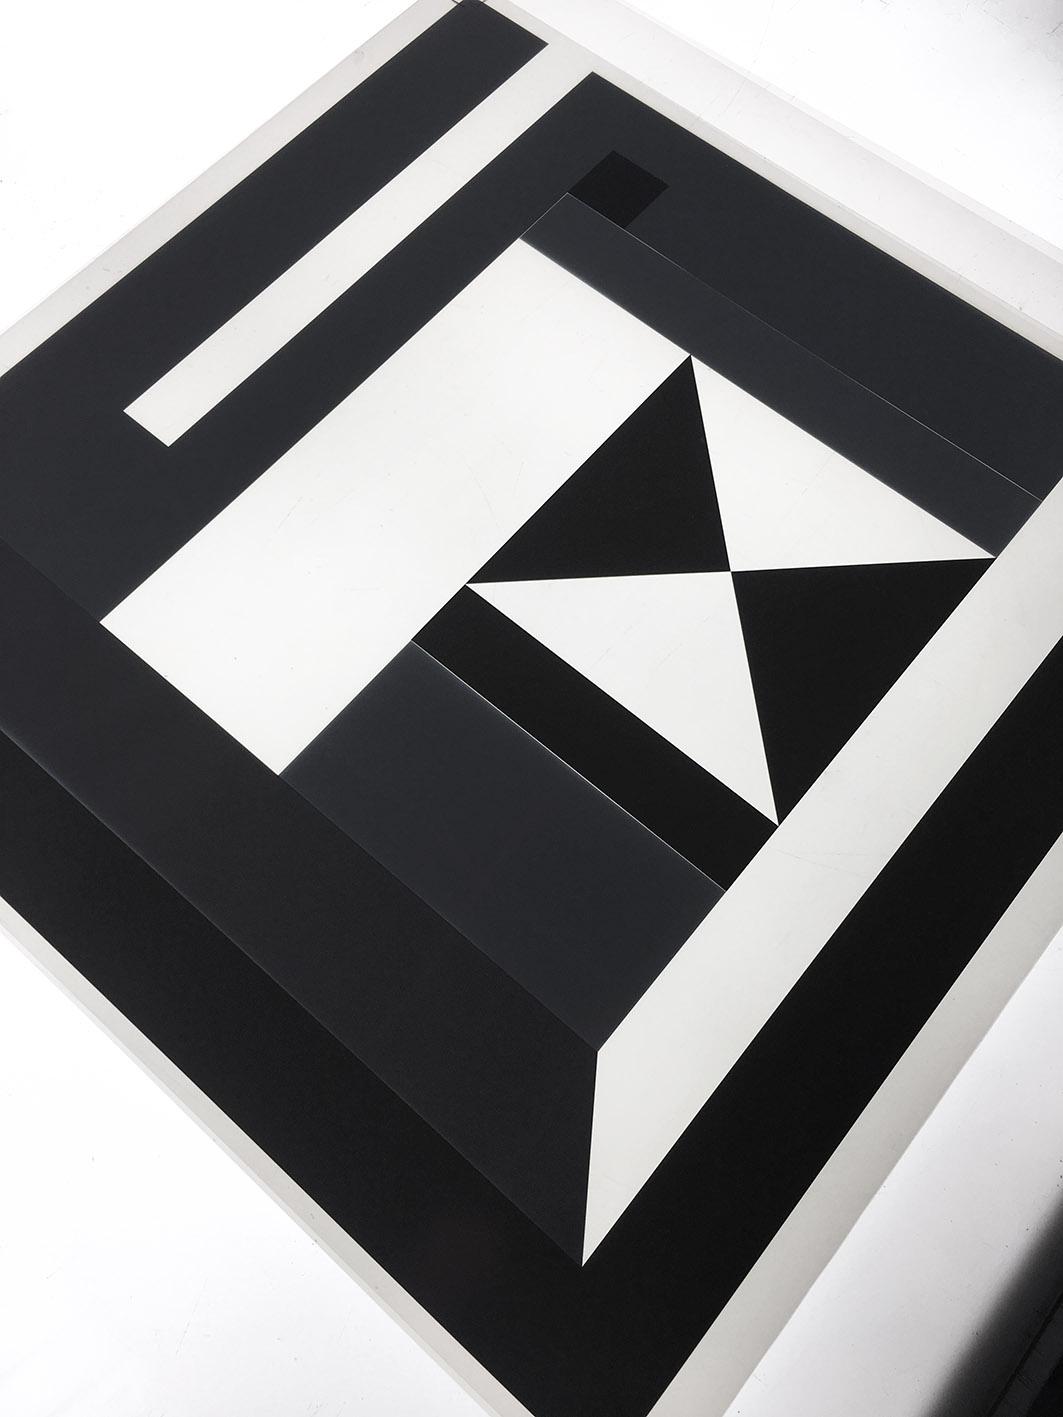 Symetria, Nathalie Du Pasquier - Ouest Typon